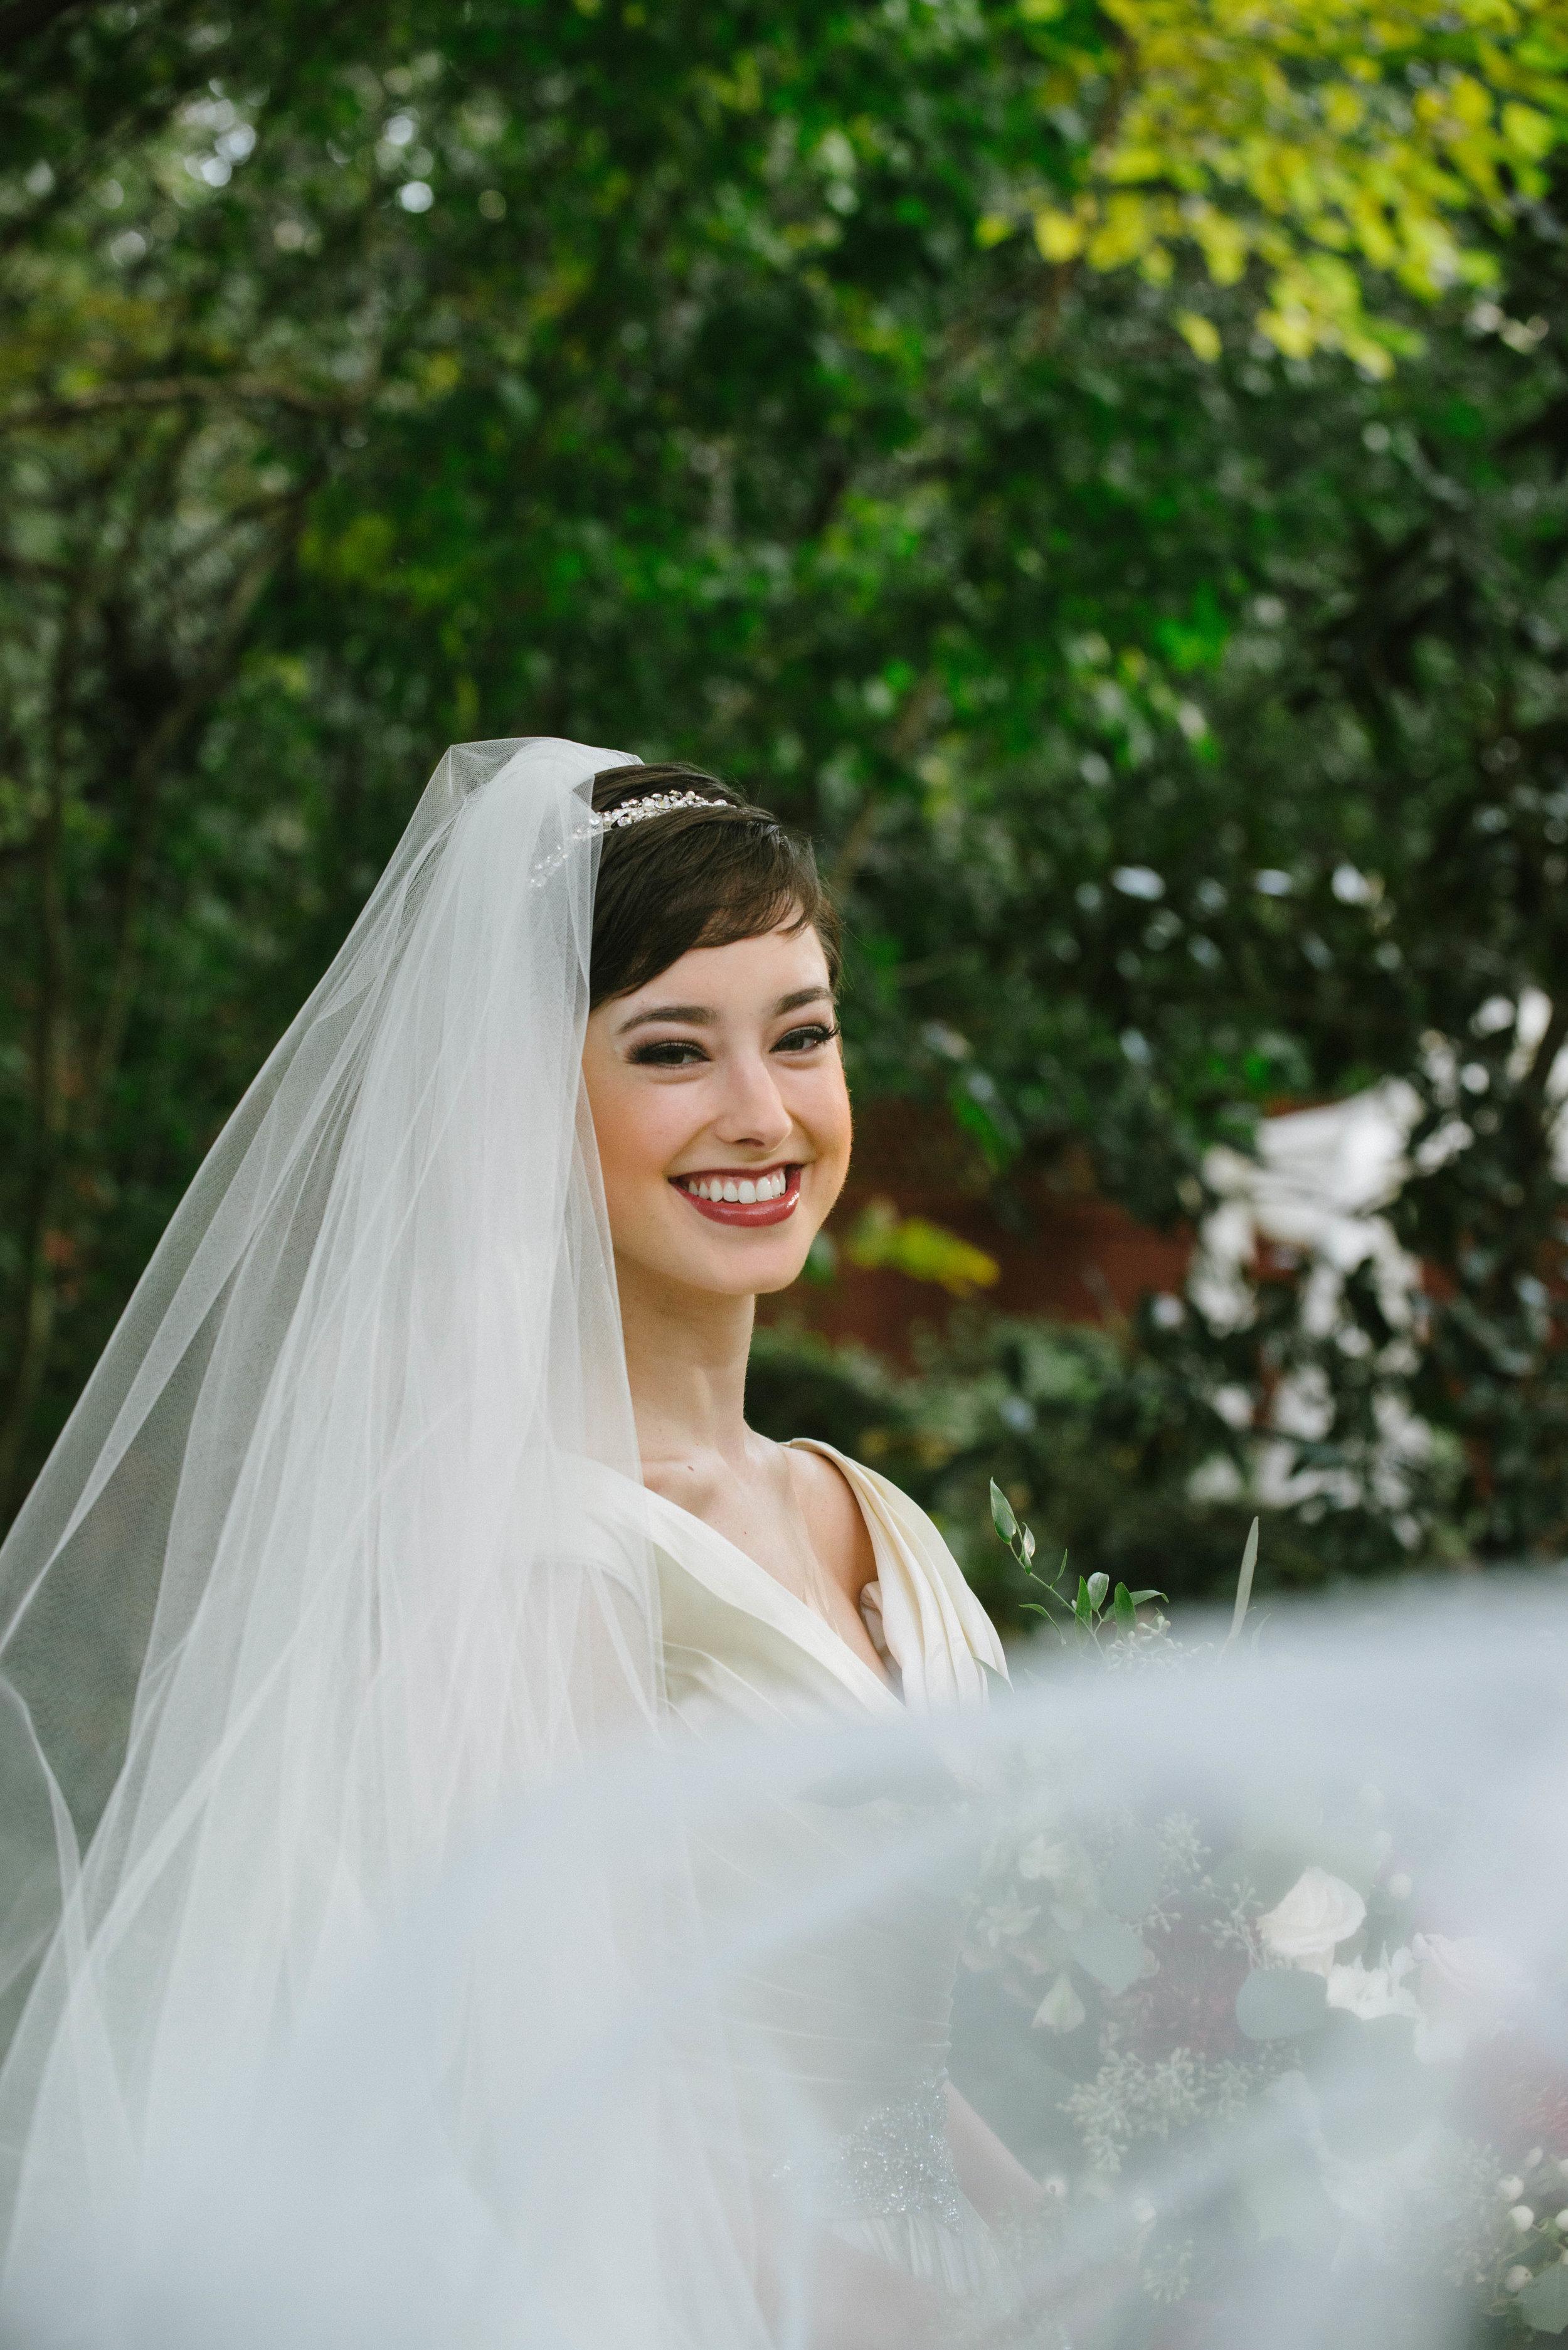 CarolineMerritt|Bridals|_Color_MiraPhotographs-70.jpg